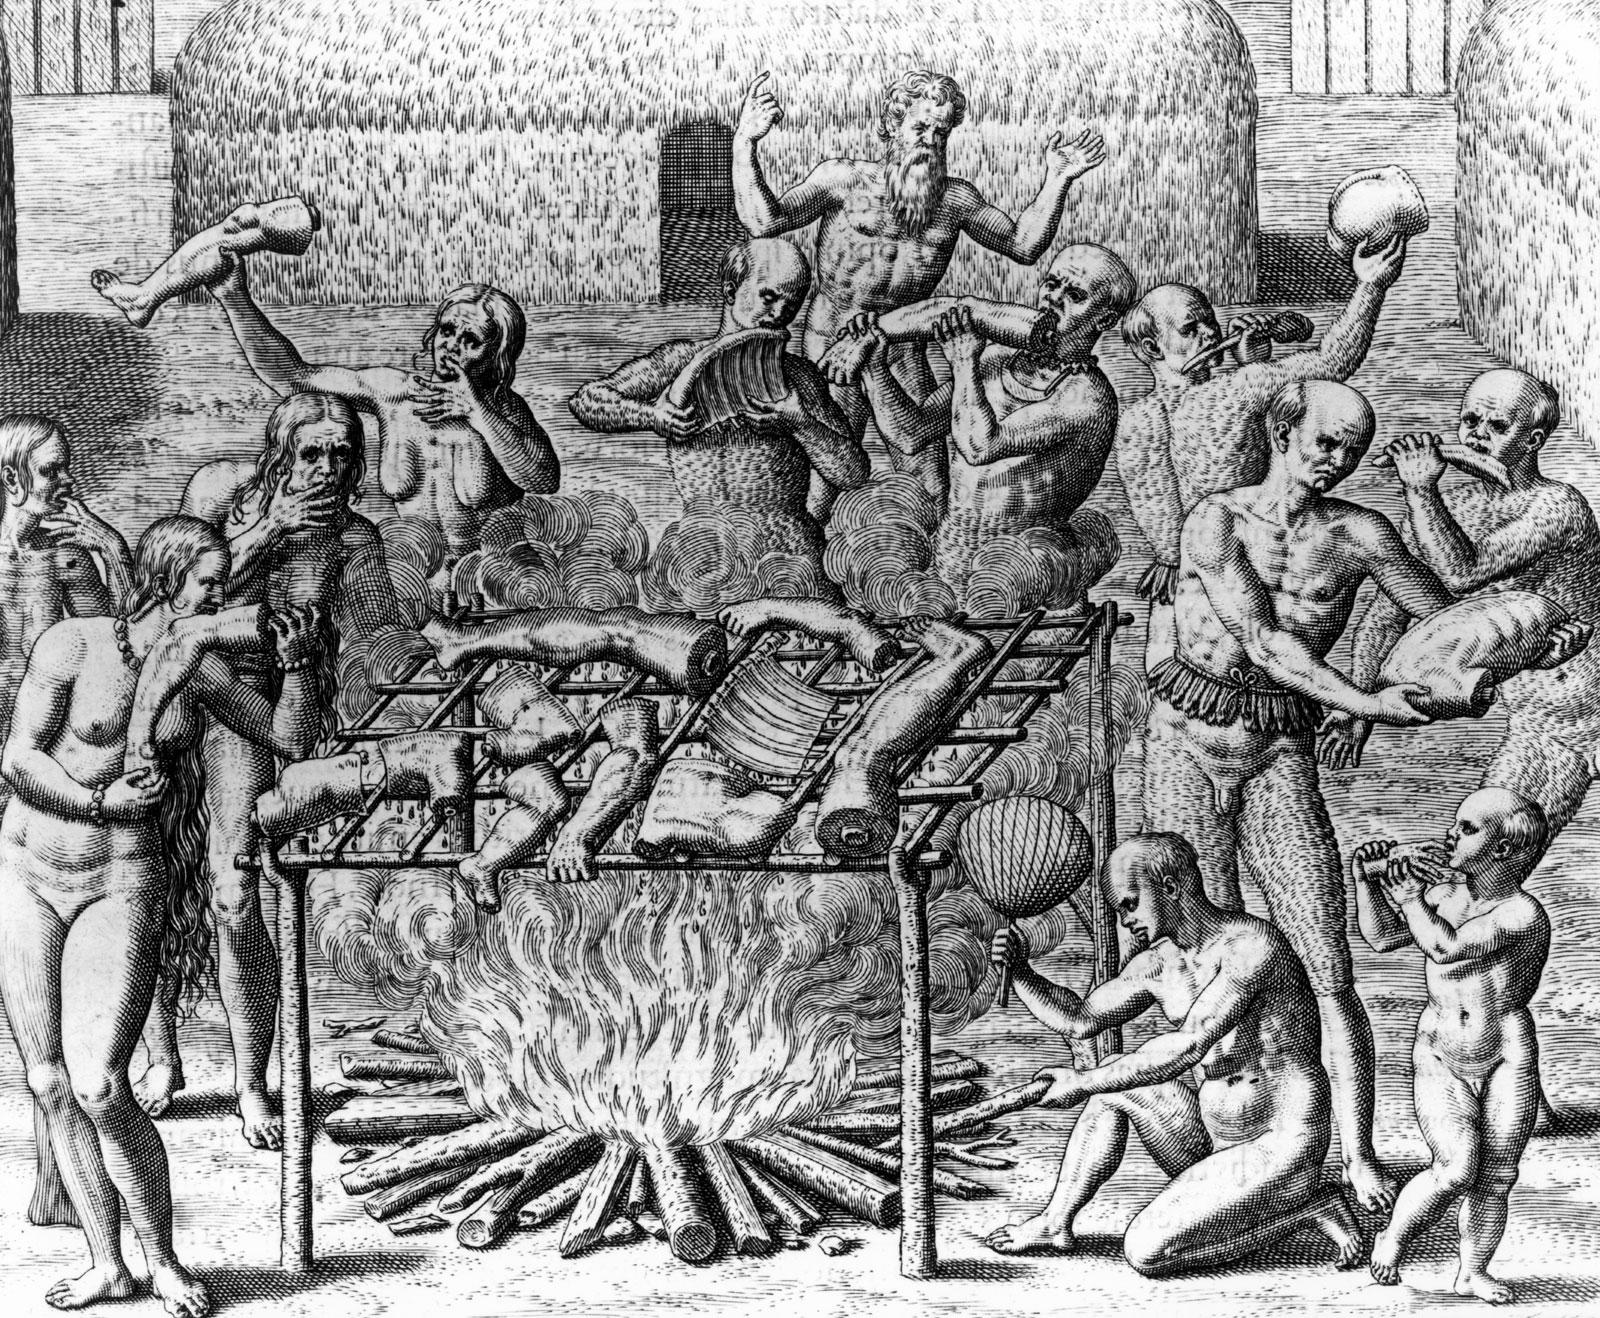 Human cannibalism engraving Theodor de Bry